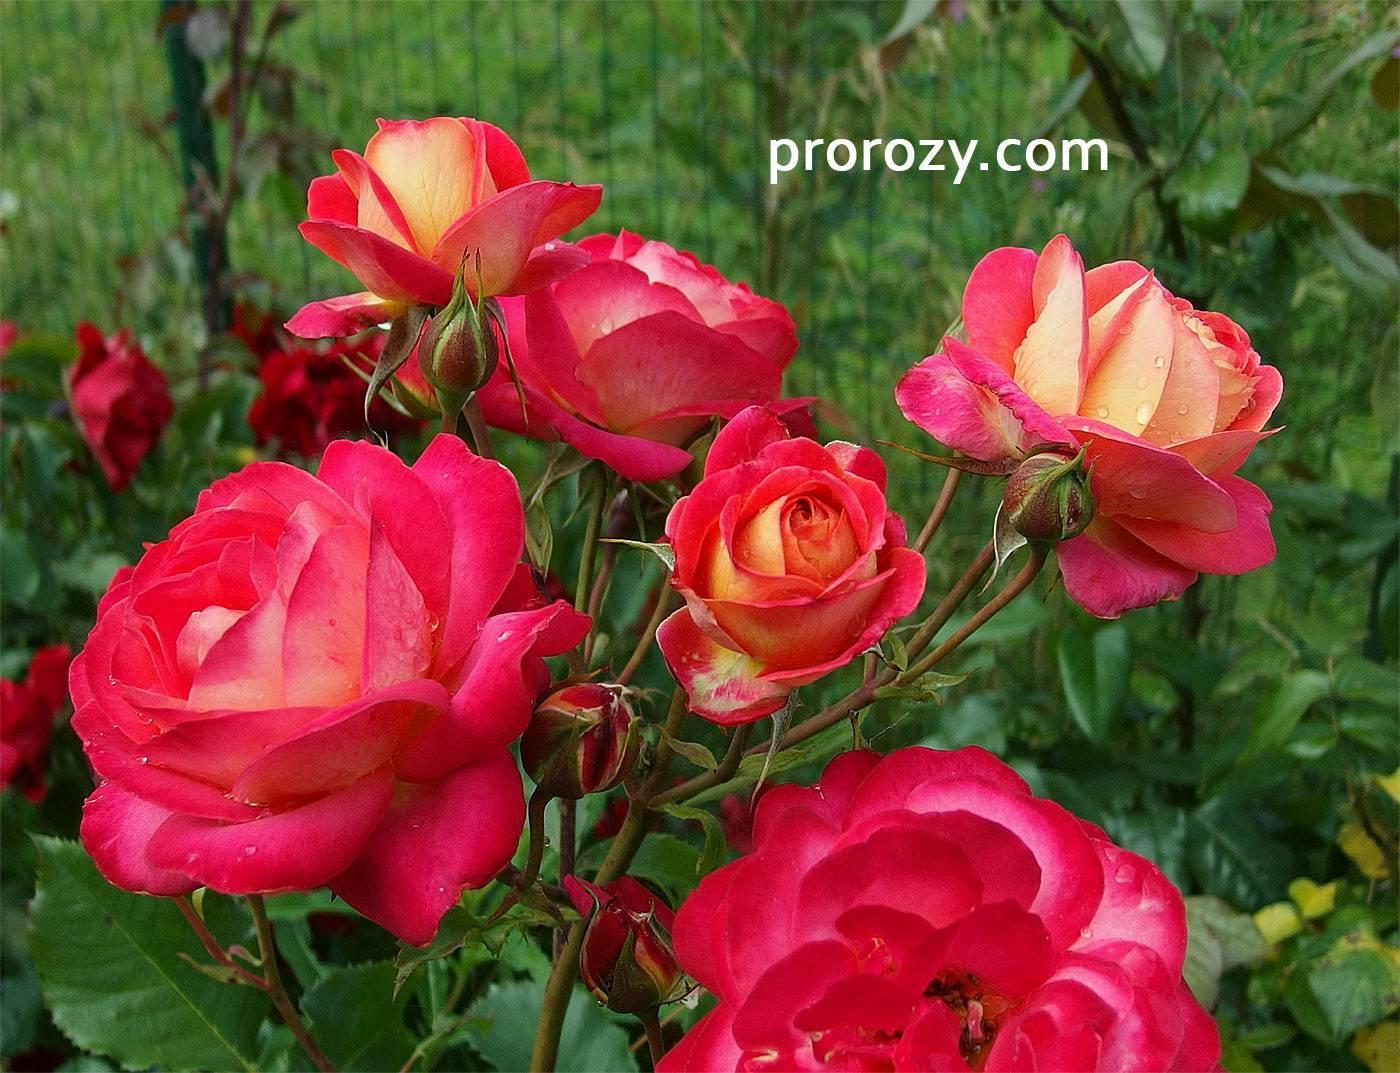 Роза мидсаммер: фото и описание сорта